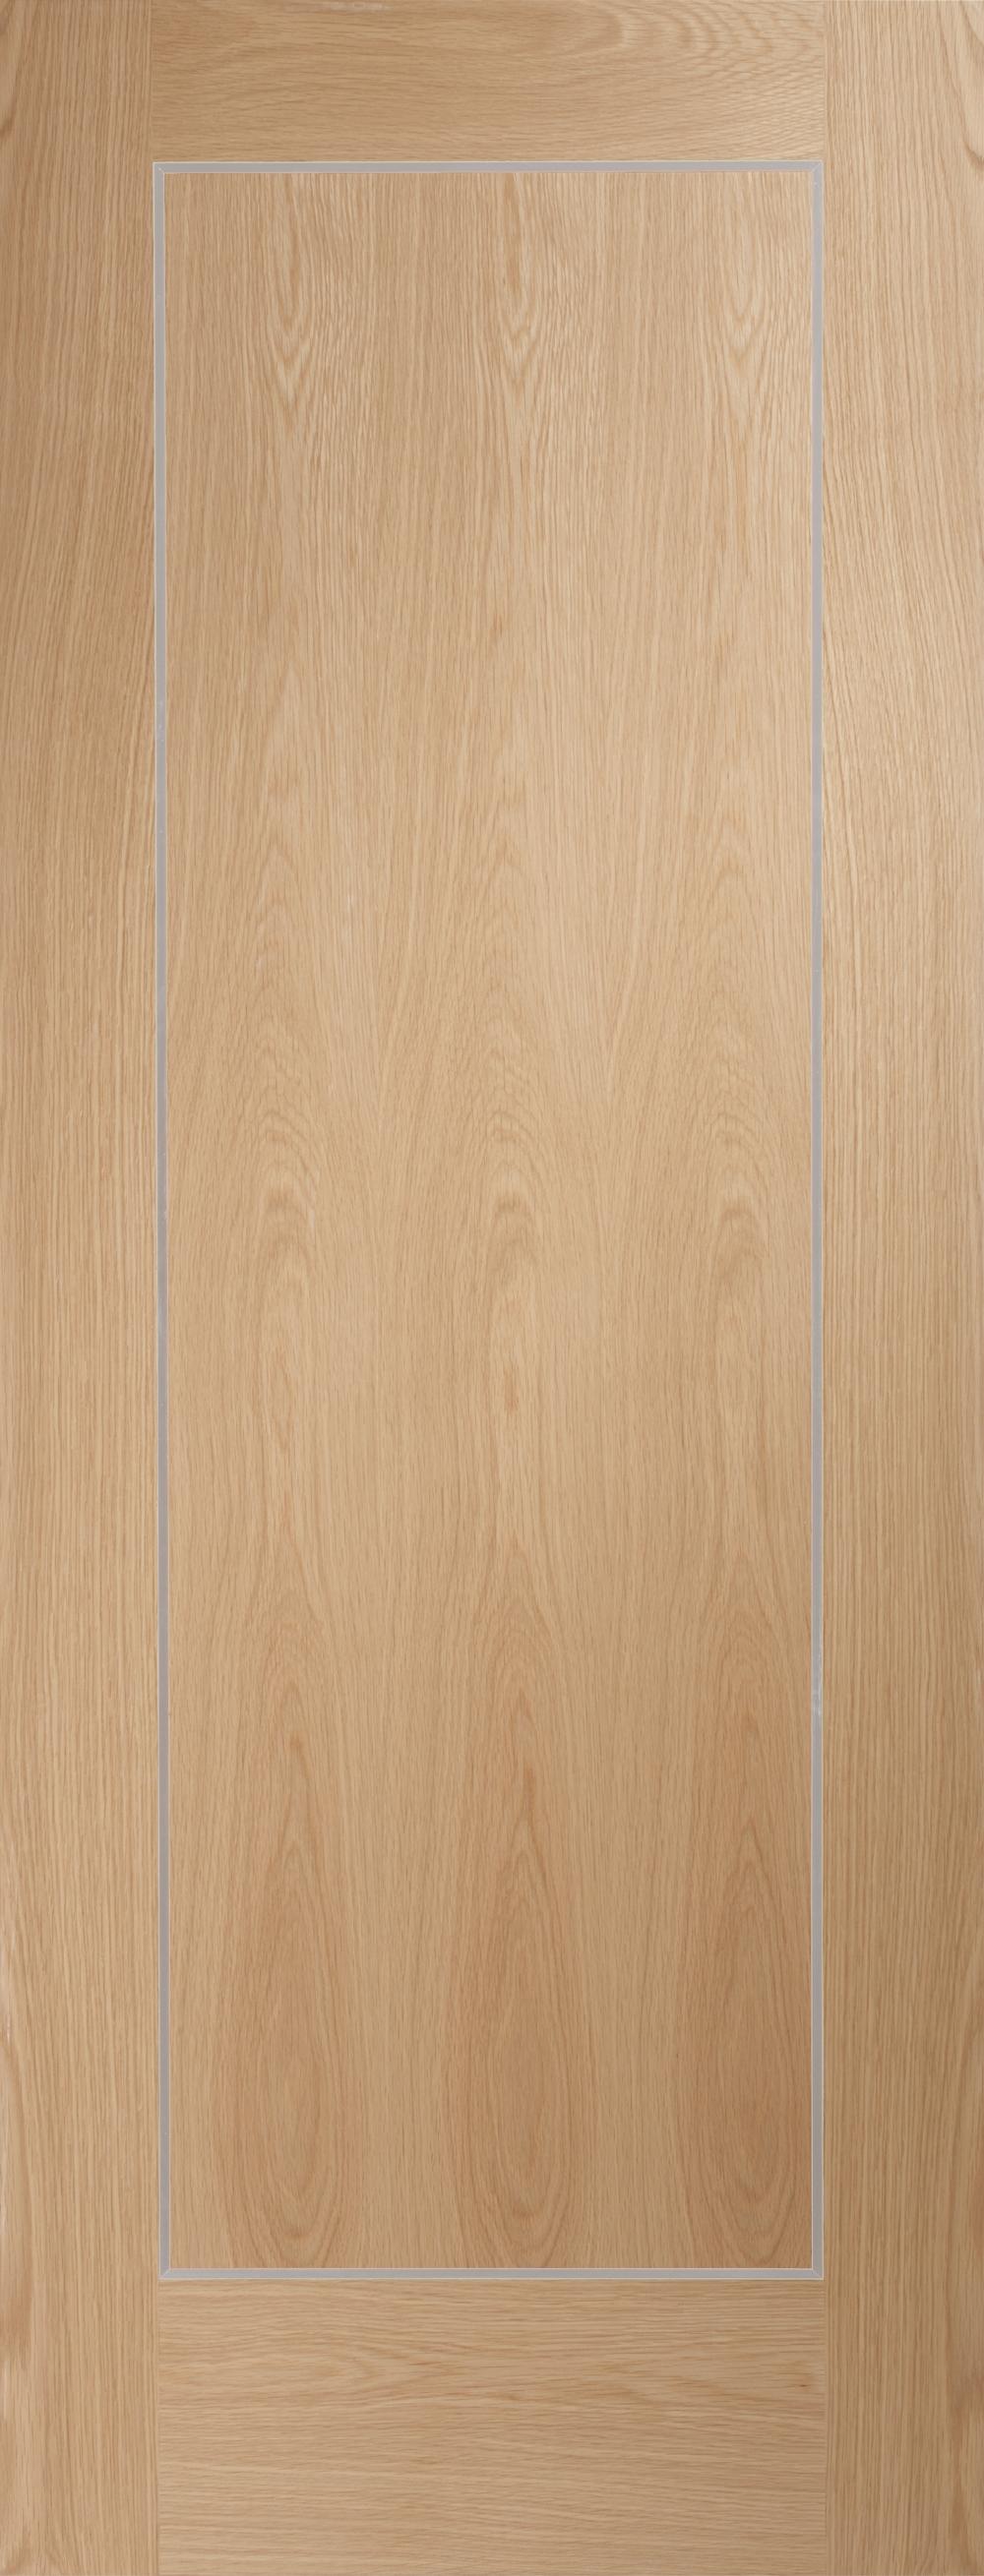 Varese Oak - PREFINISHED